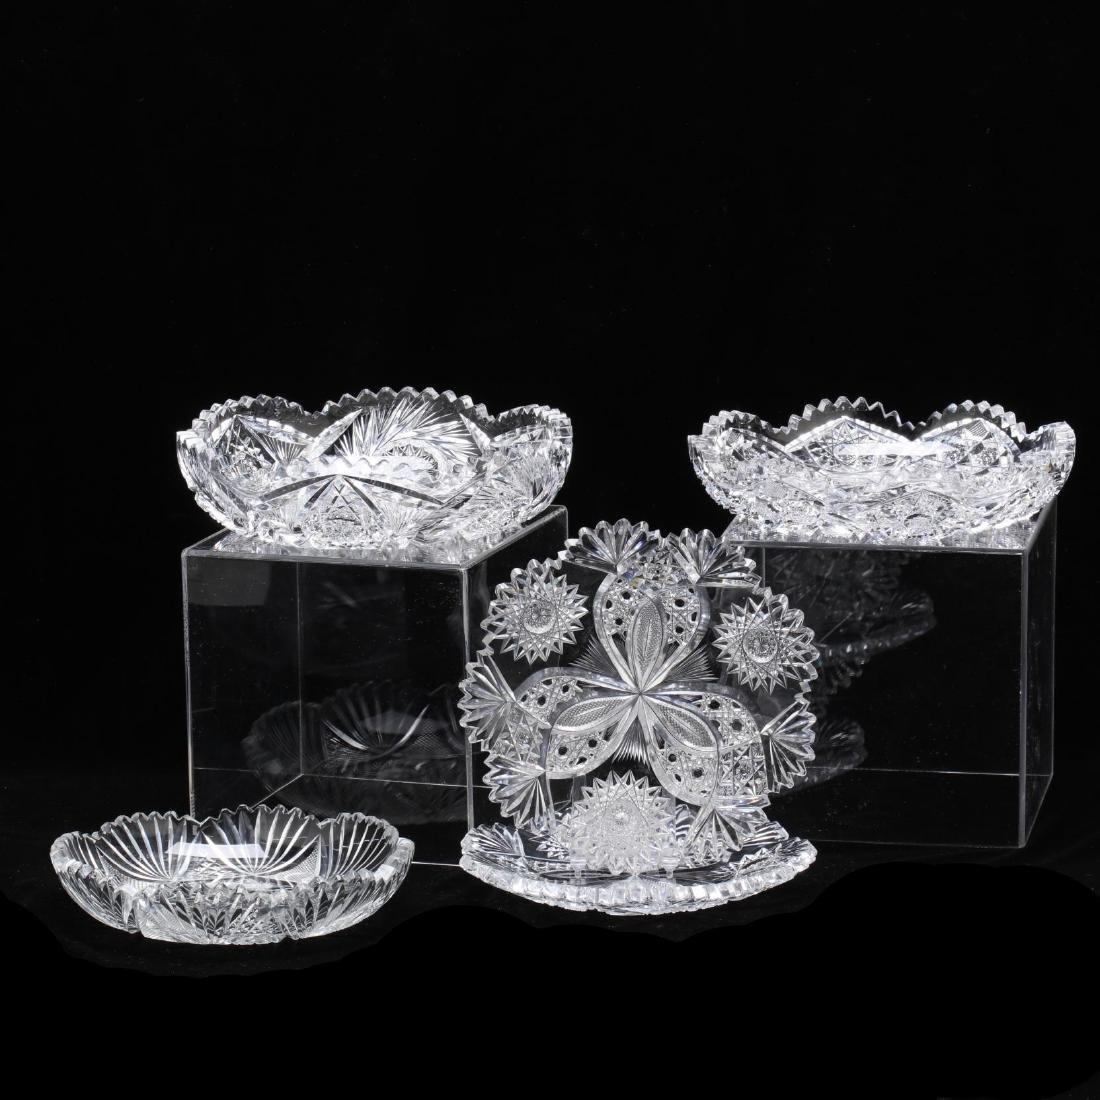 Five Pieces of American Brilliant Period Cut Glass